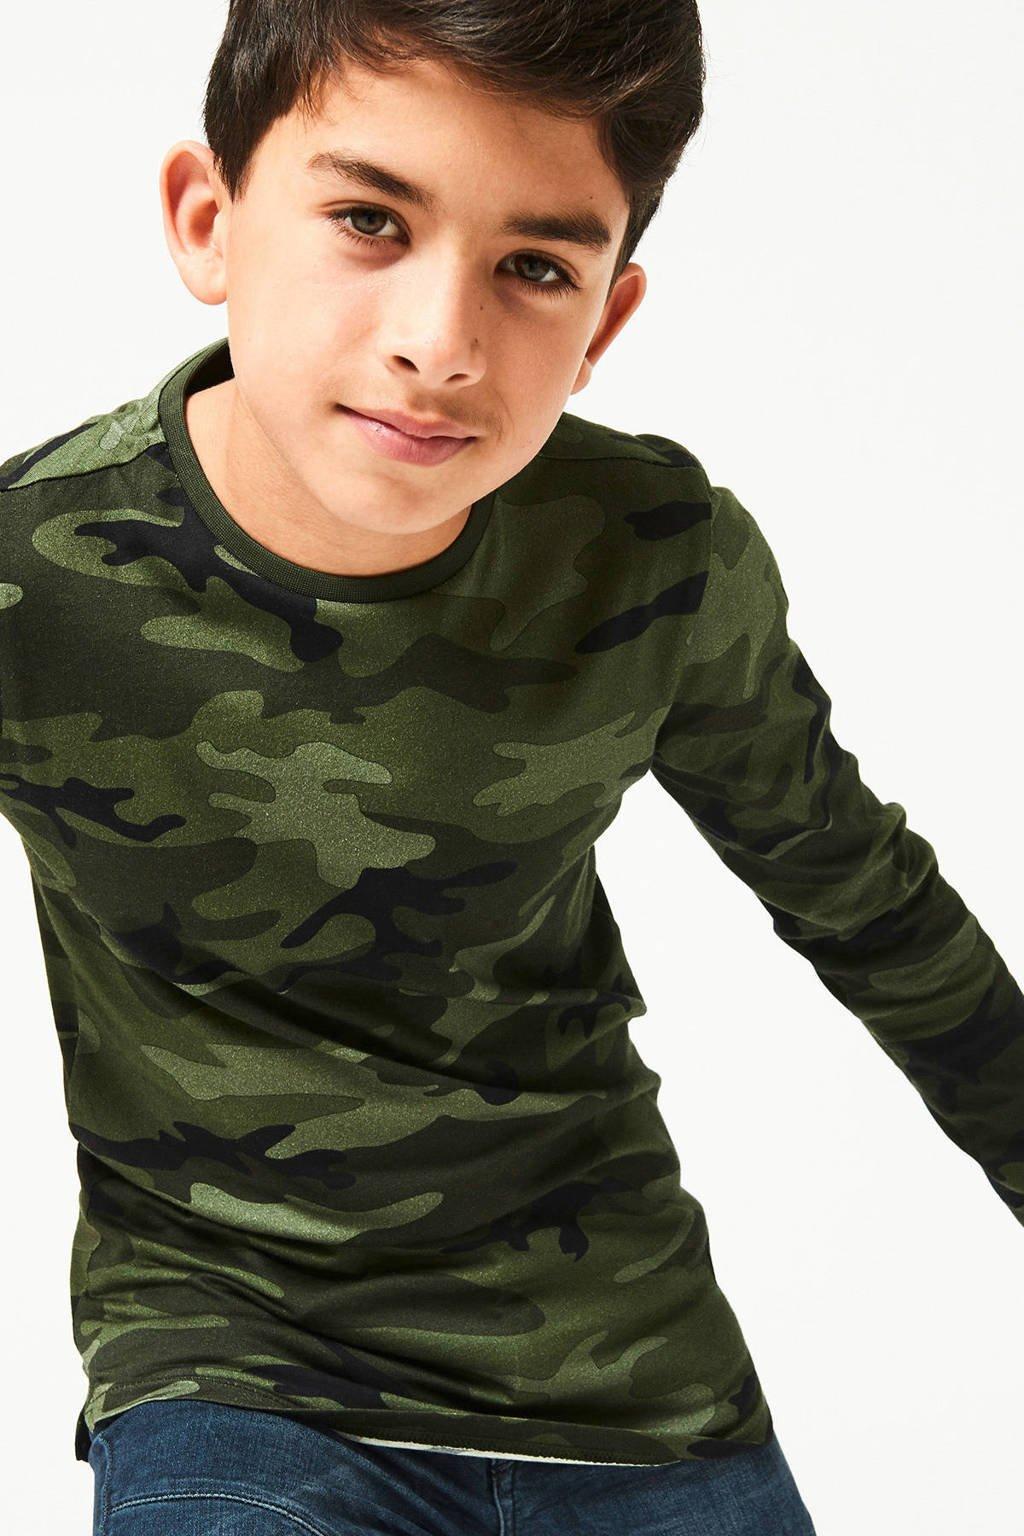 CoolCat Junior longsleeve Leroy met camouflageprint groen, Groen